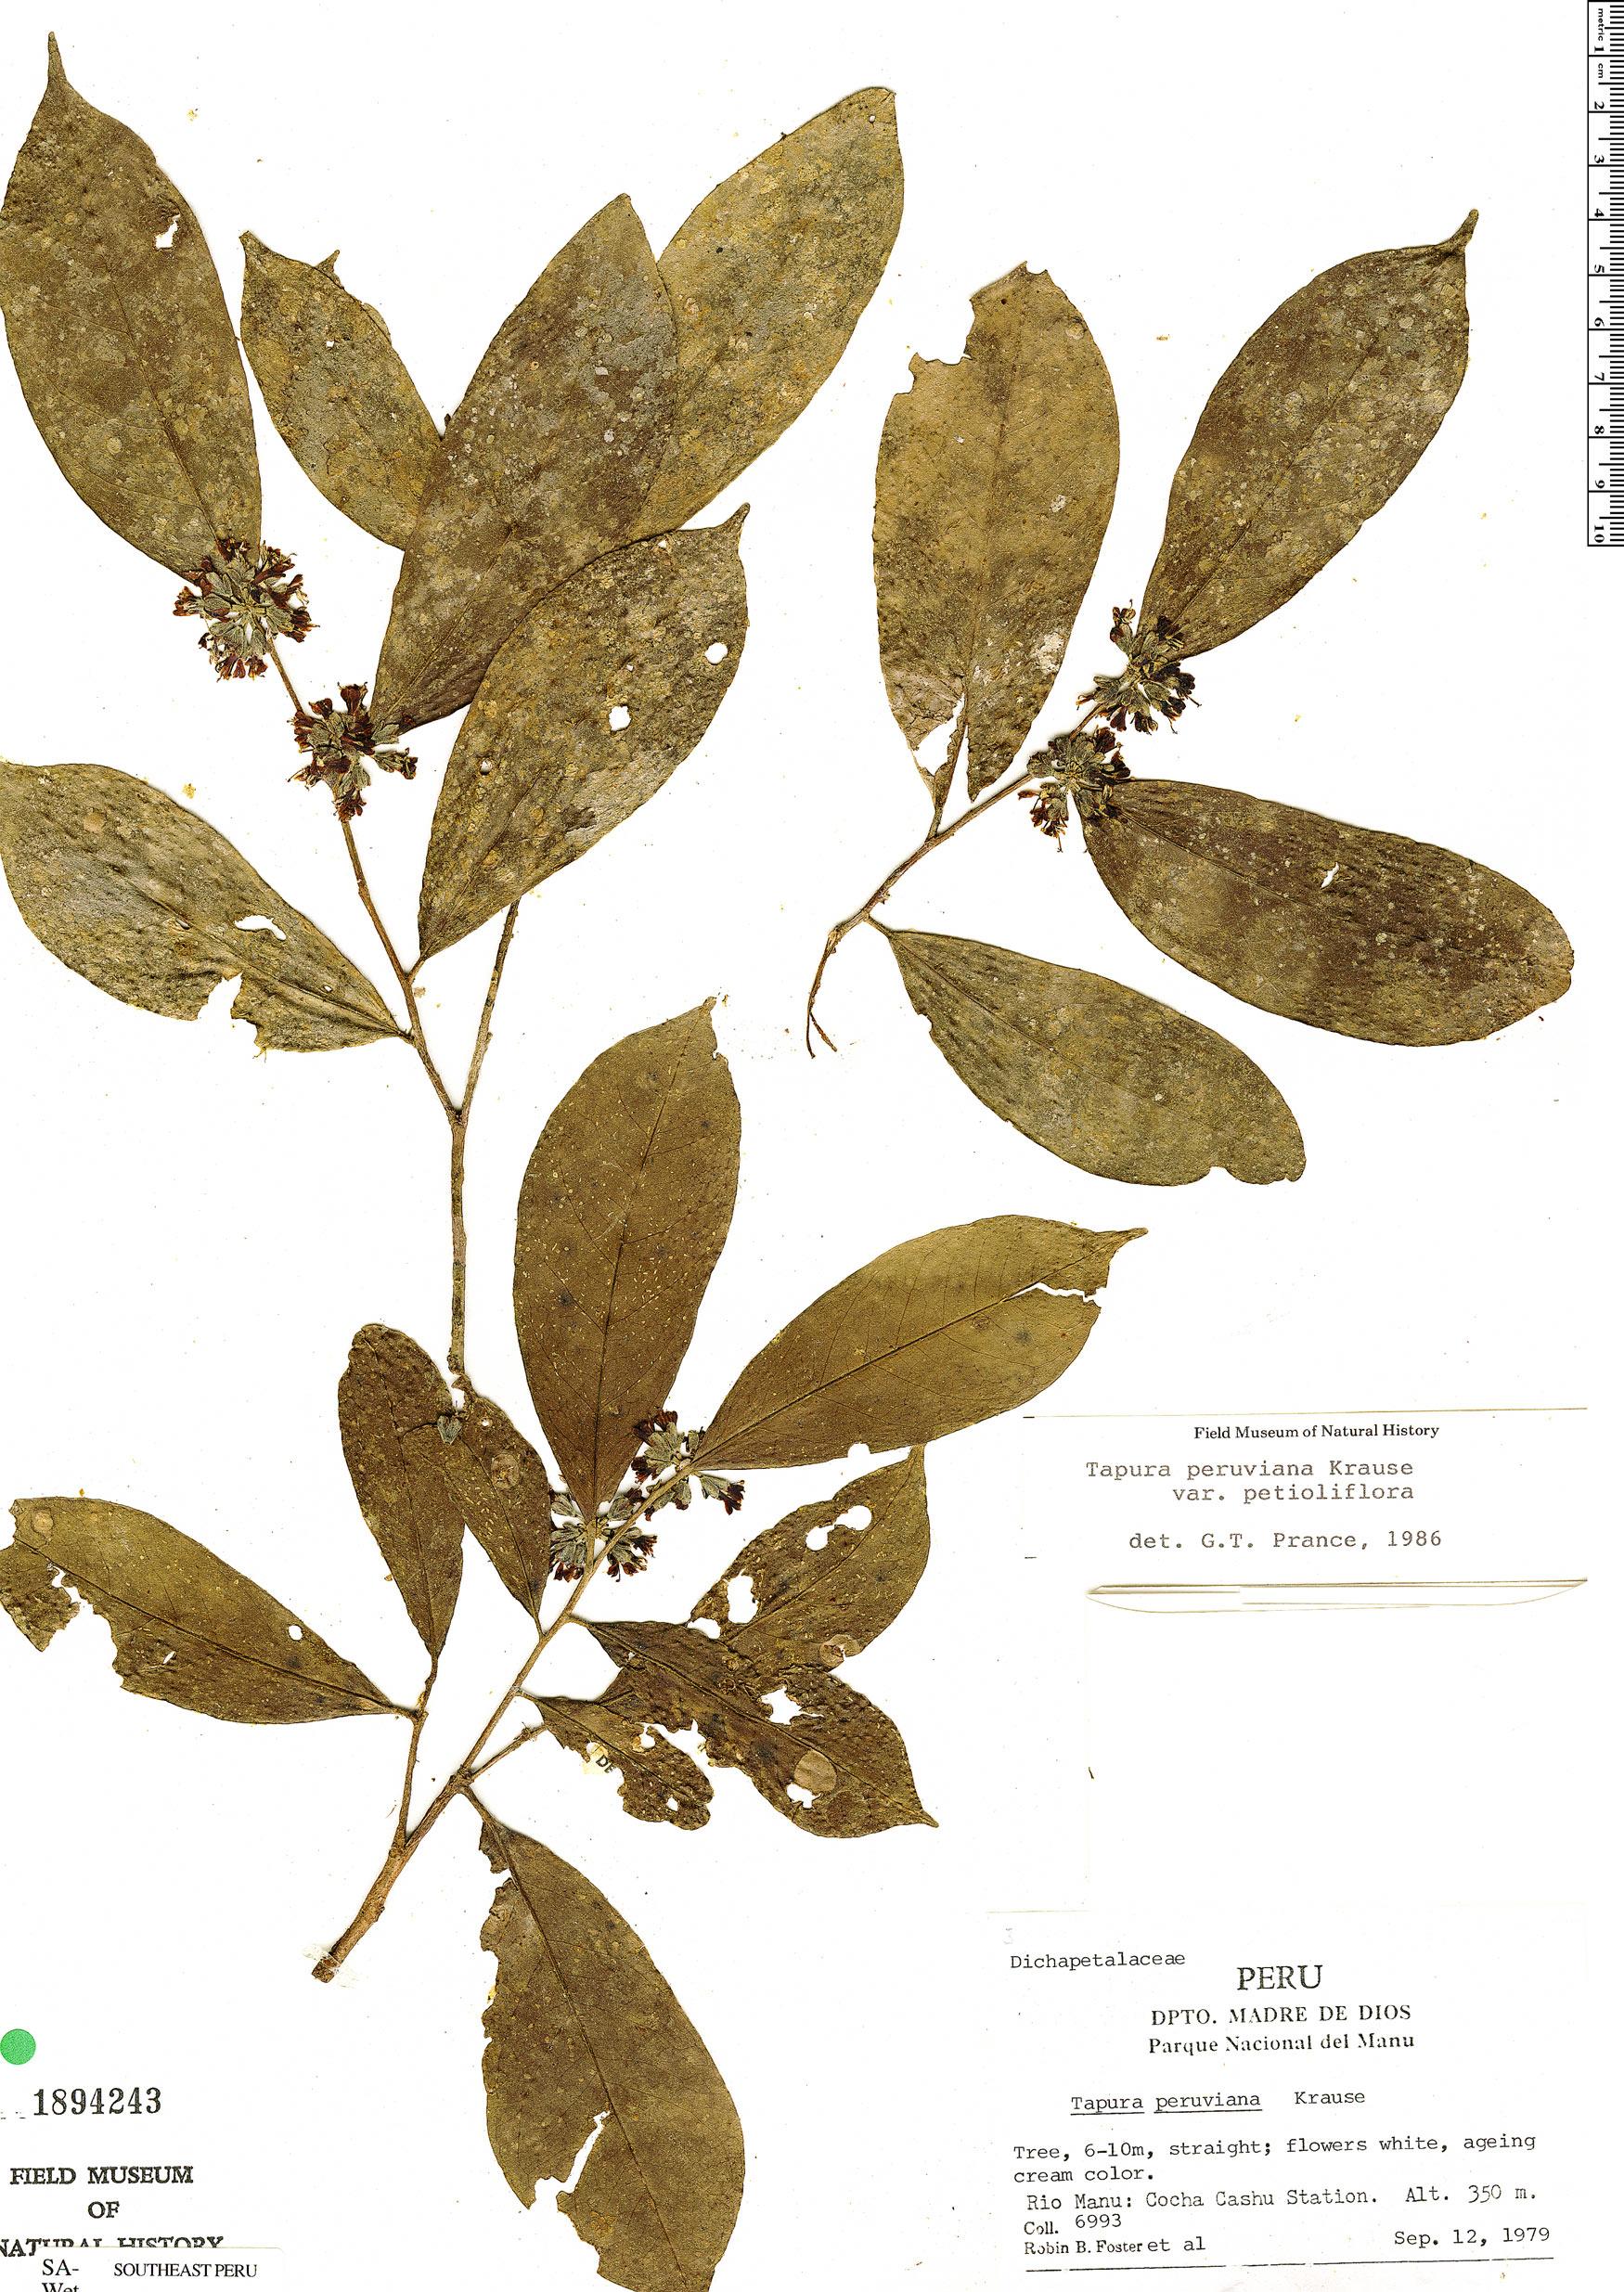 Specimen: Tapura peruviana